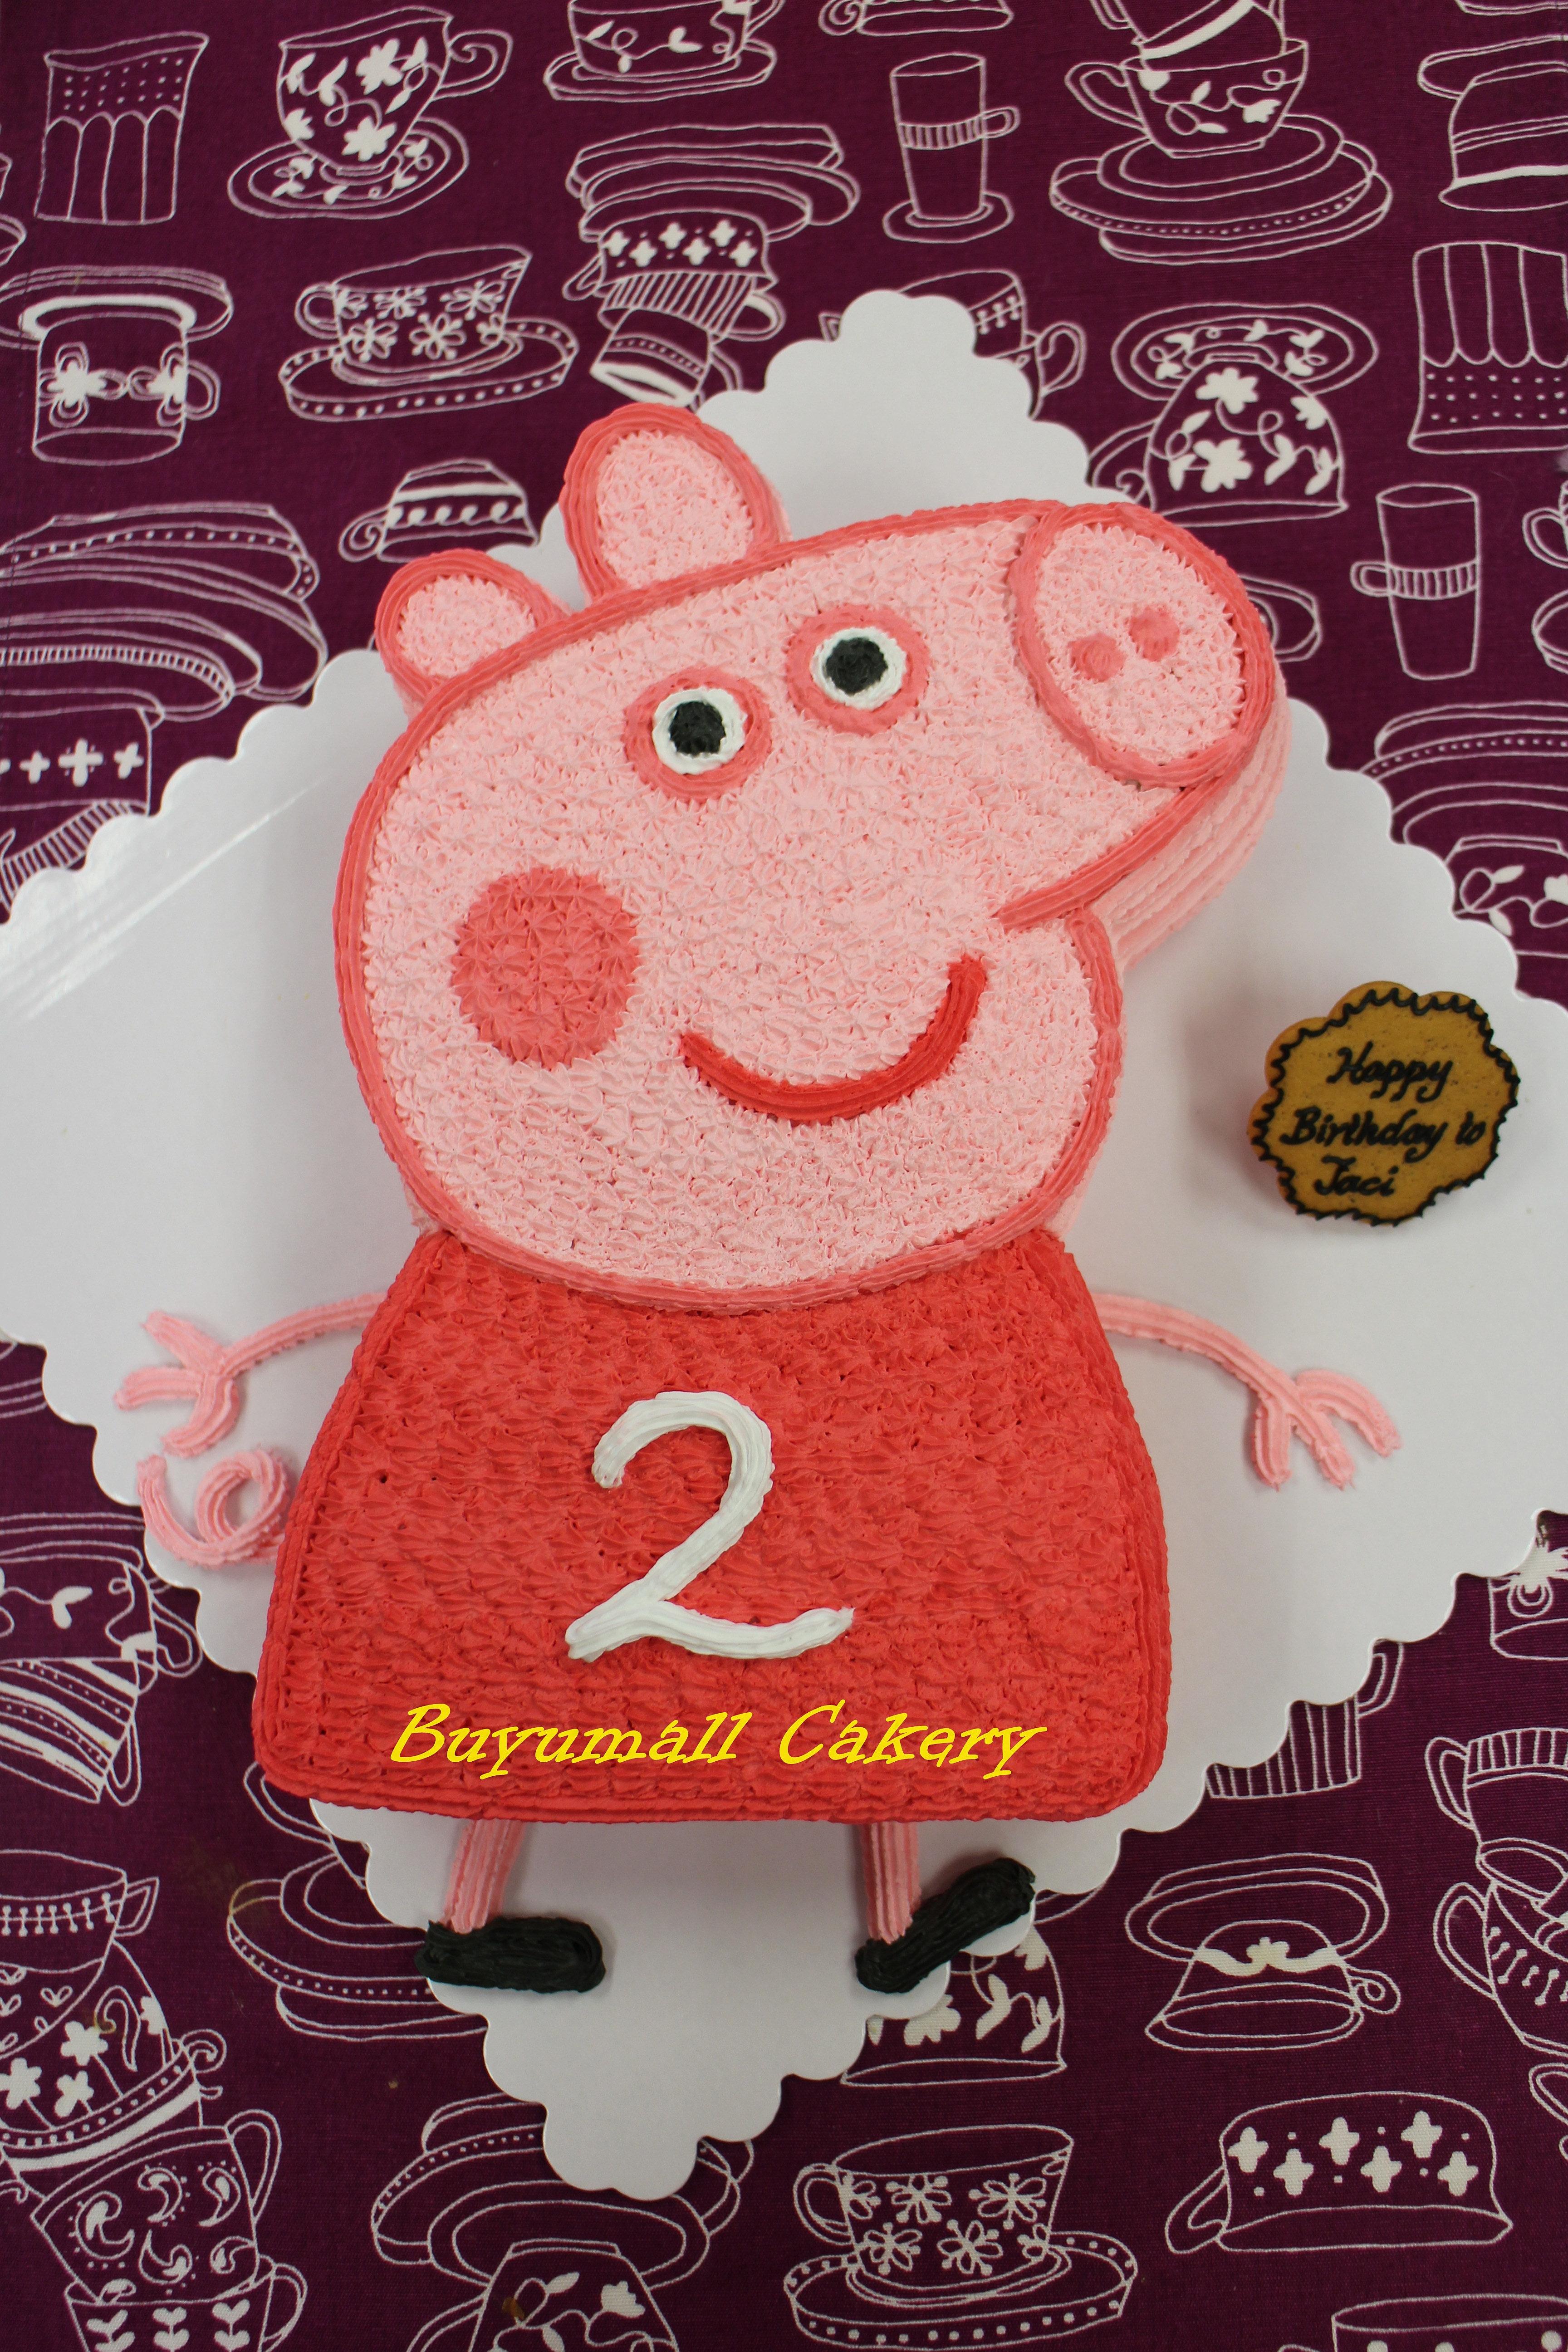 Buyumall Cakery & Decoratings | Peppa Pig 粉紅豬小妹 佩佩豬